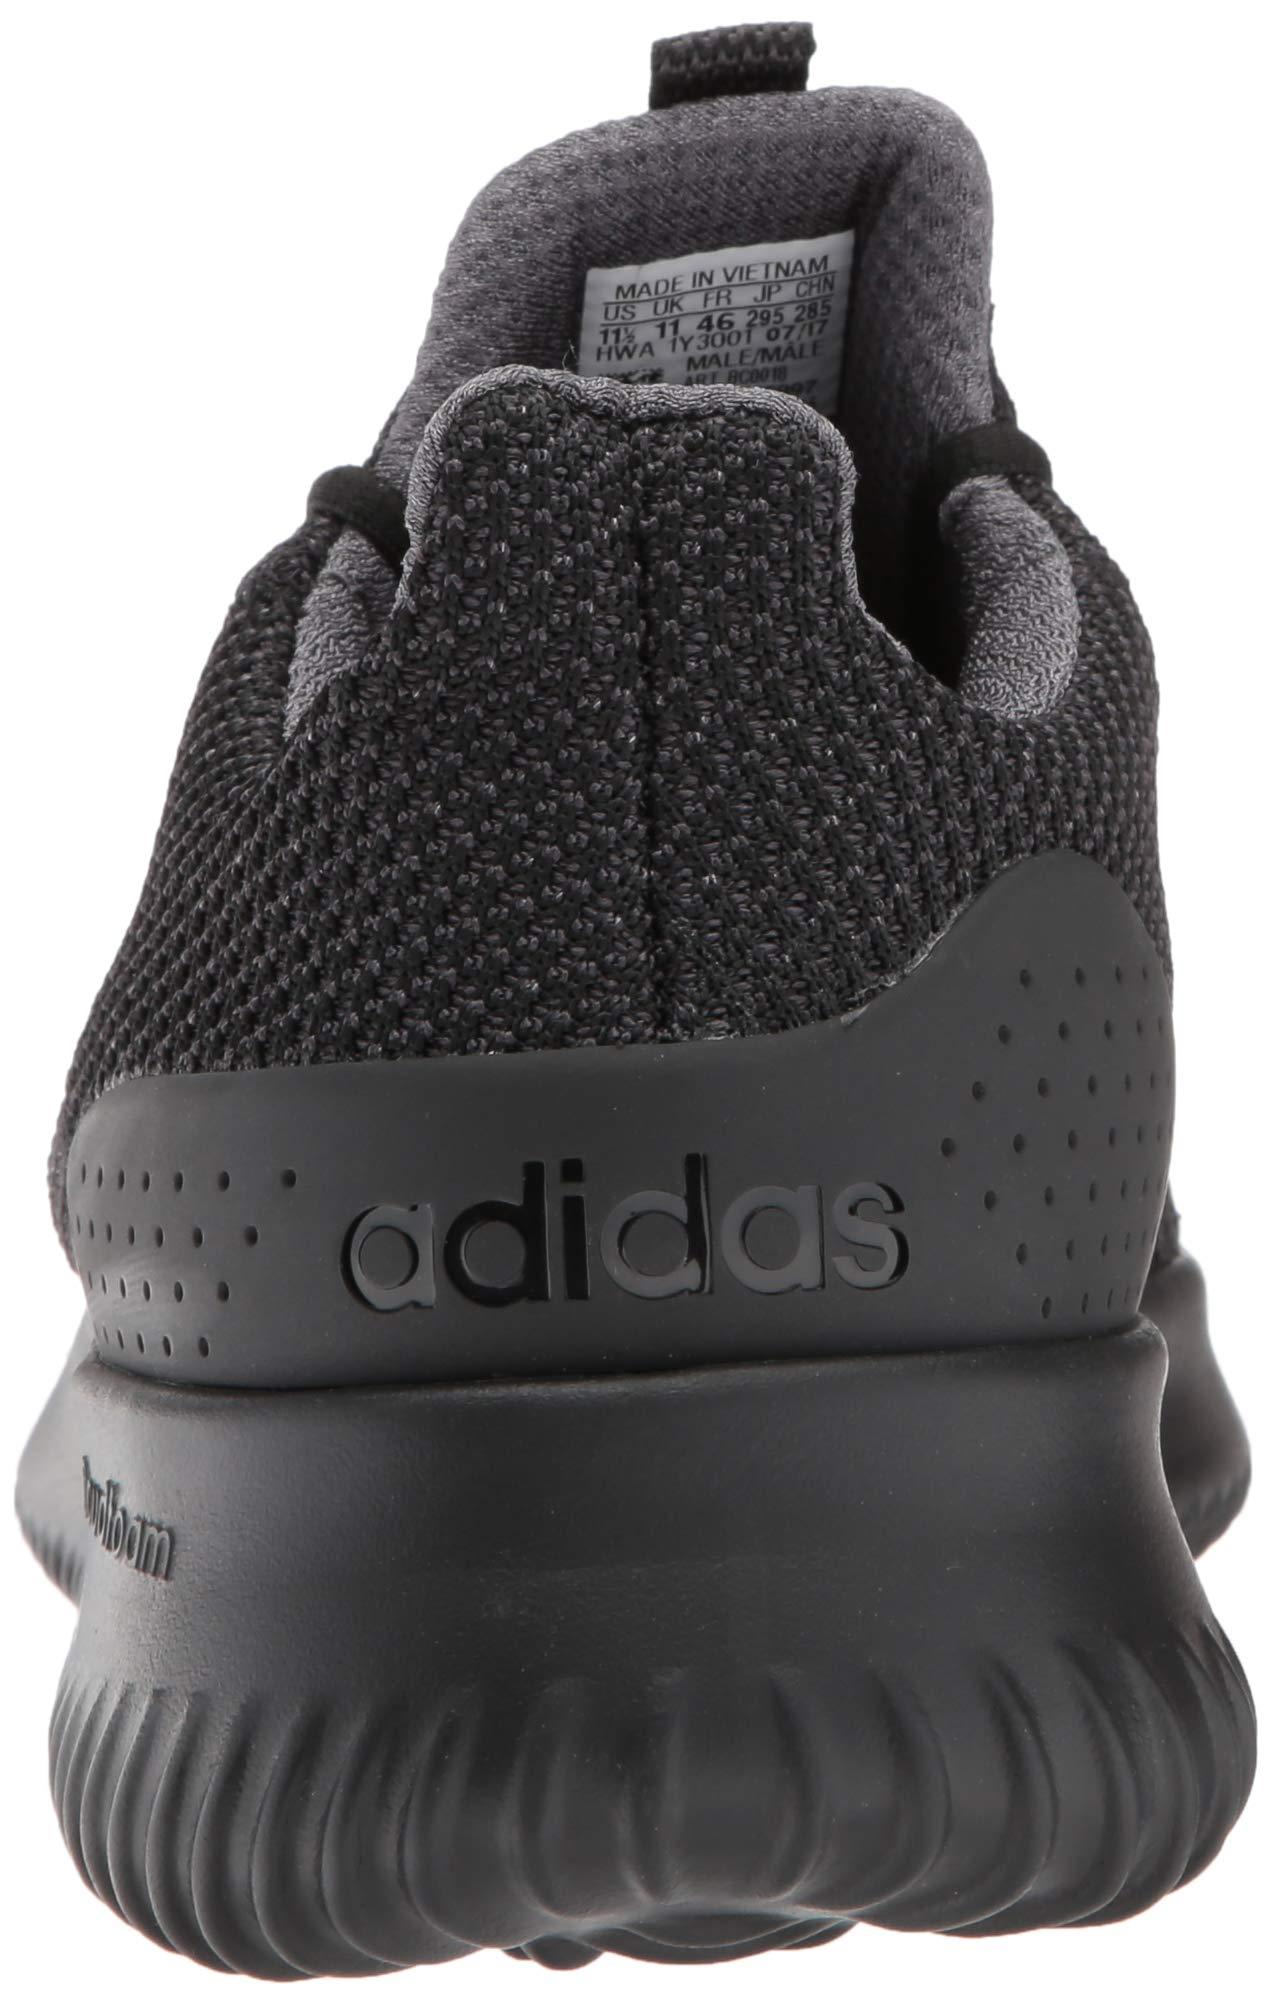 adidas Men's Cloudfoam Ultimate Running Shoe Utility Black, 9.5 M US by adidas (Image #2)